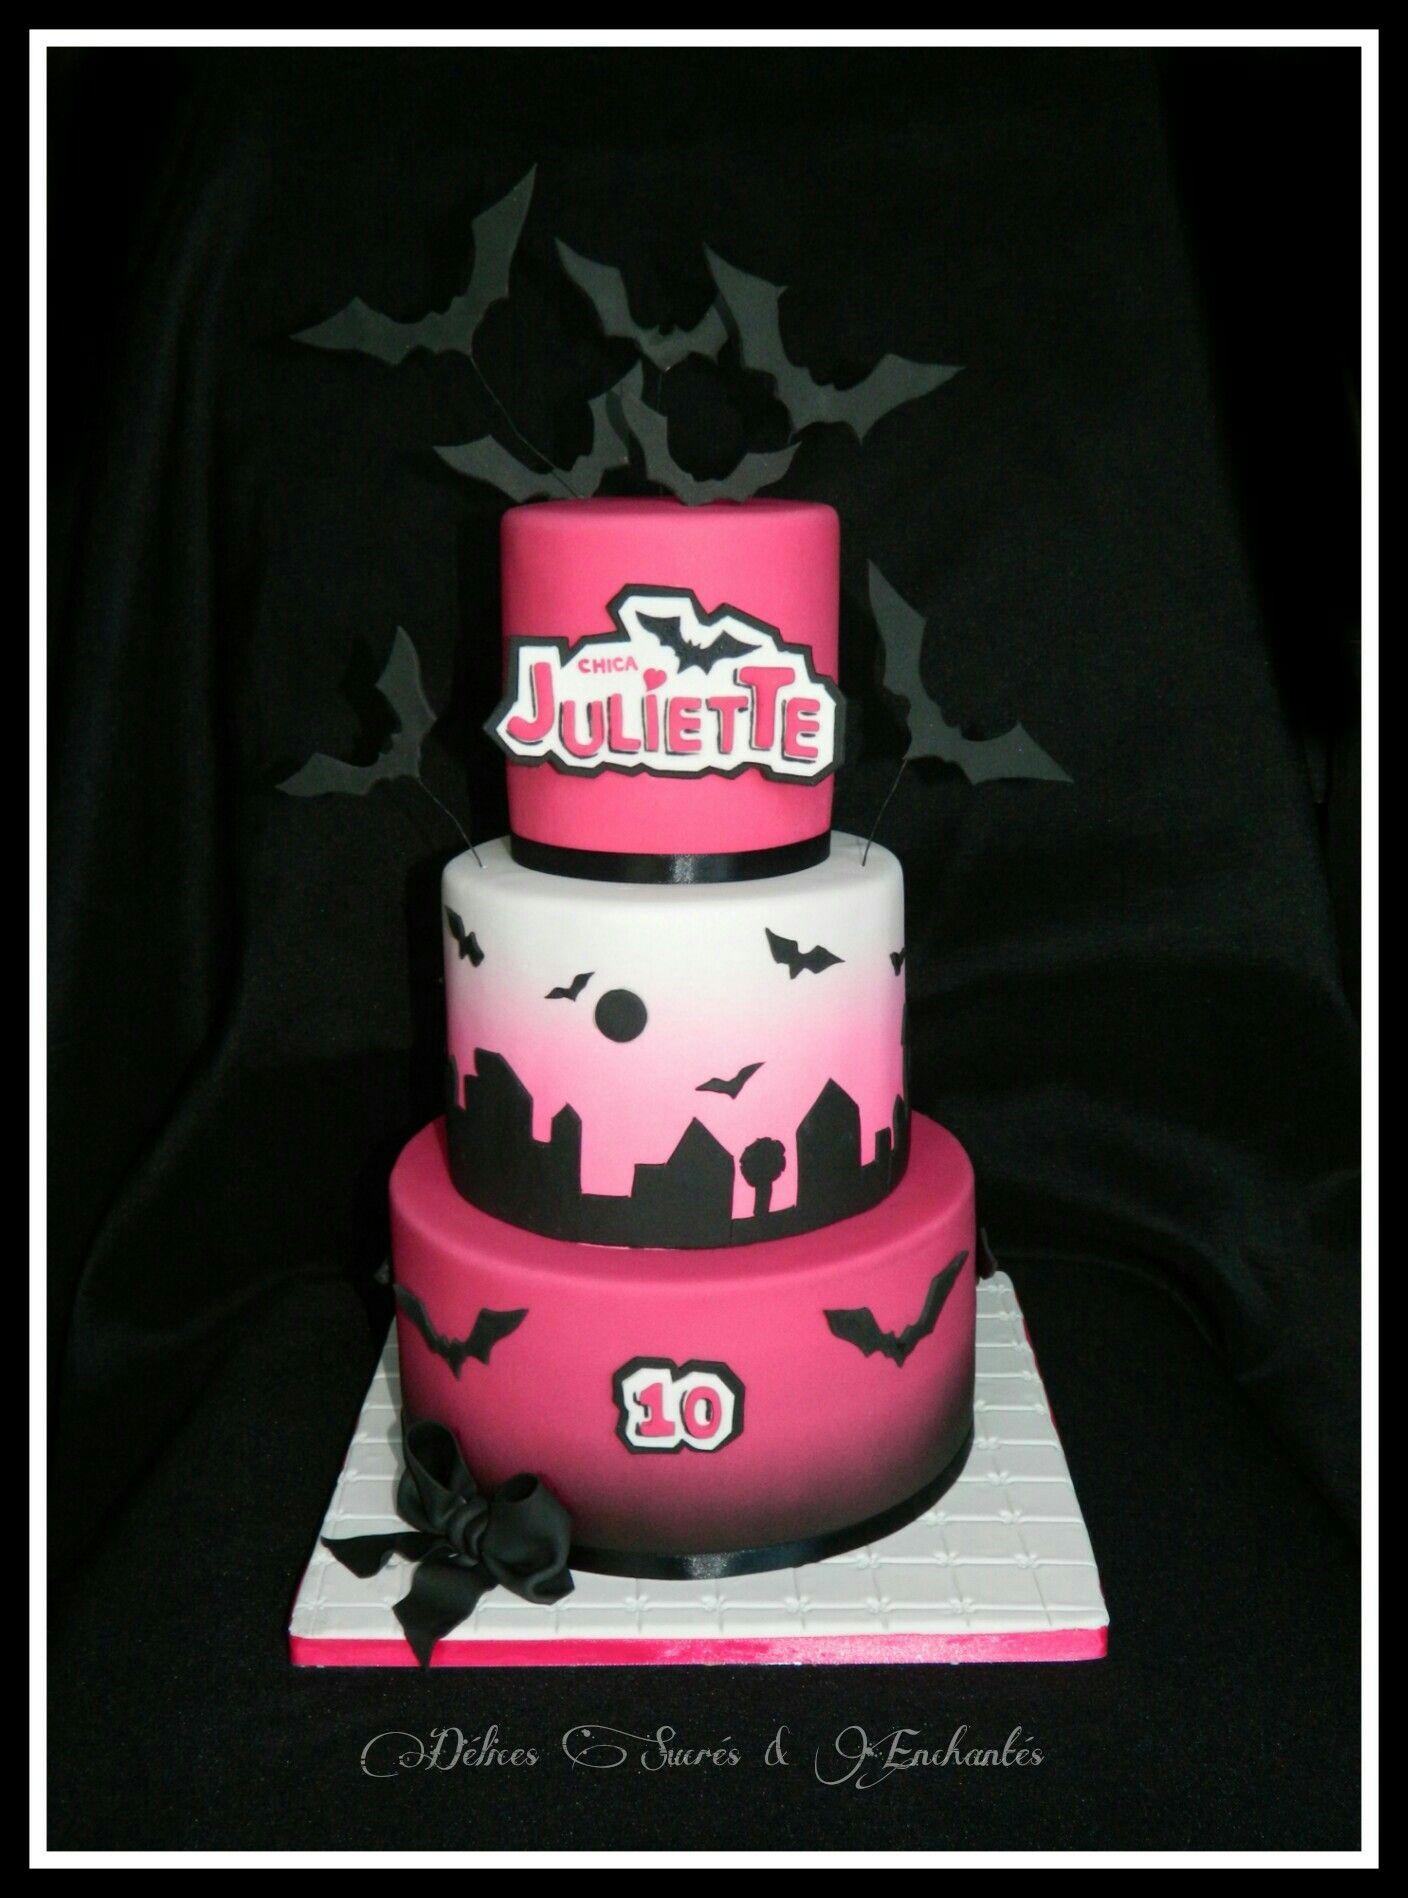 Cake Chica Vampiro 1 Dlices Sucrs Enchants Pinterest Cake